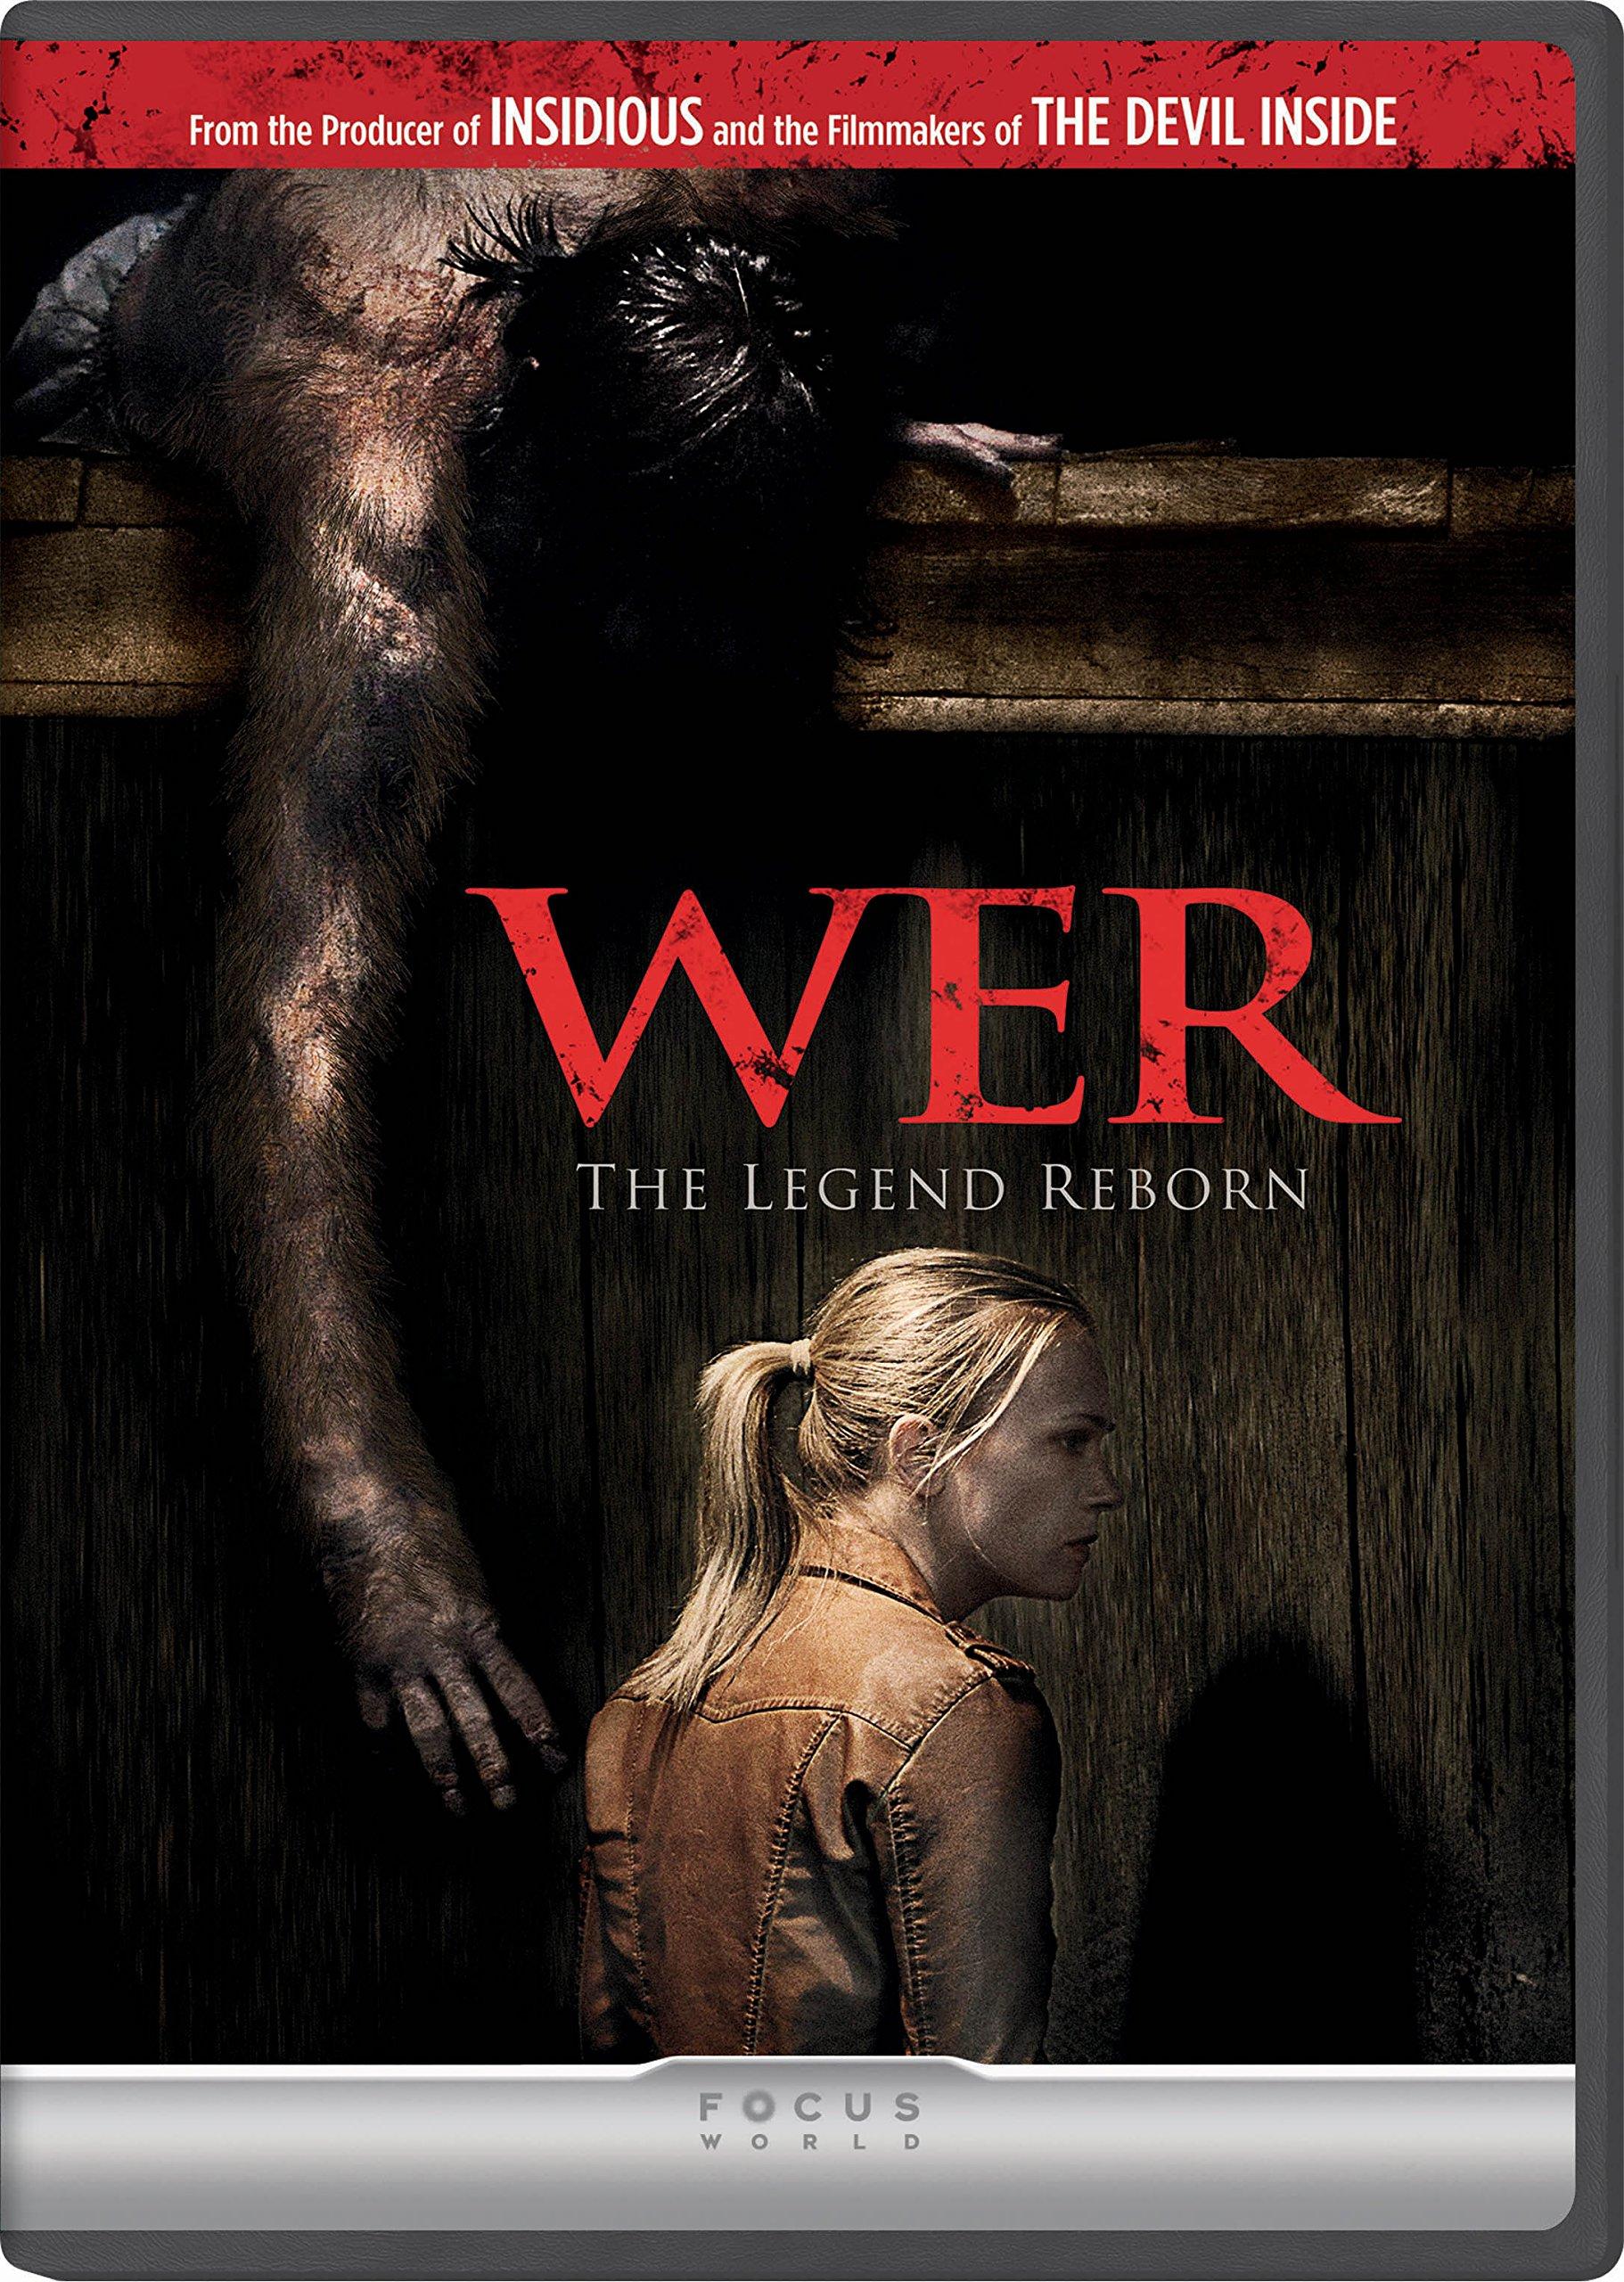 Wer (2013) - DVD PLANET STORE